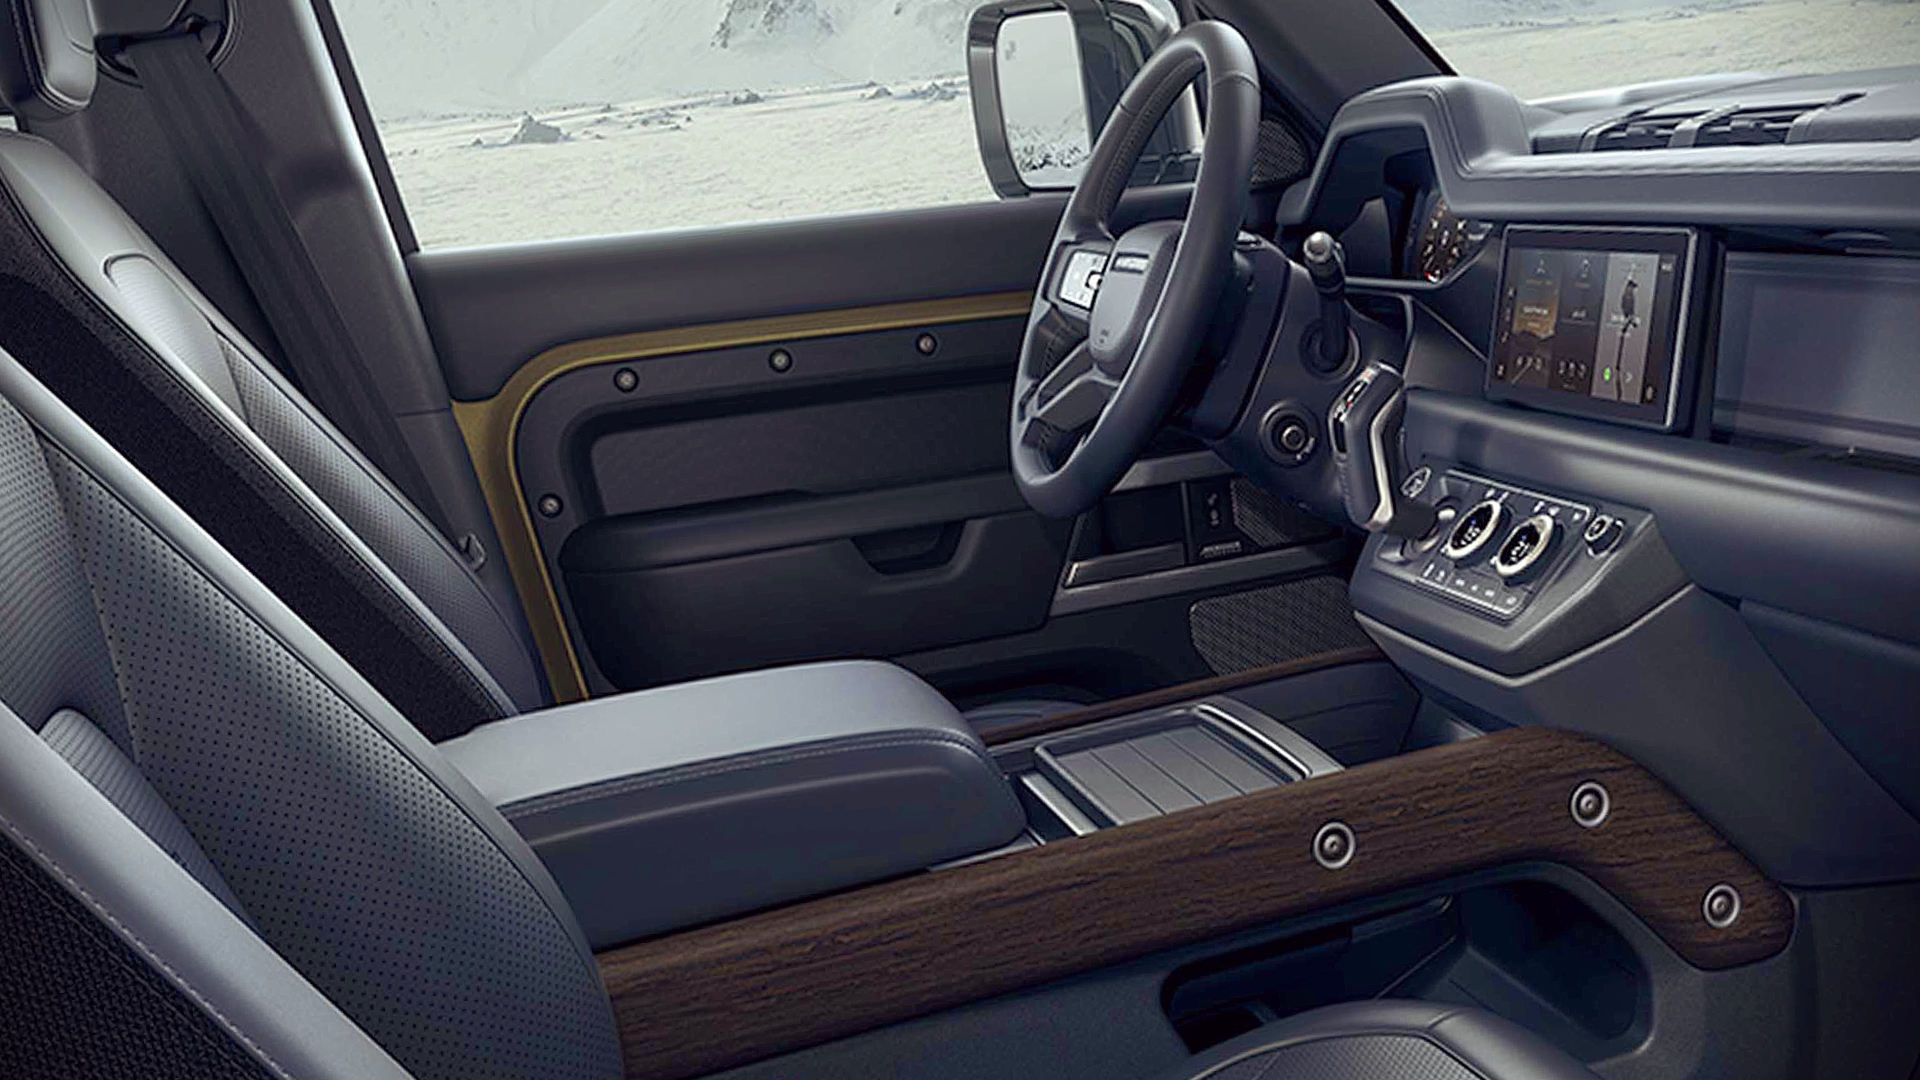 New Land Rover Defender 110 Interior